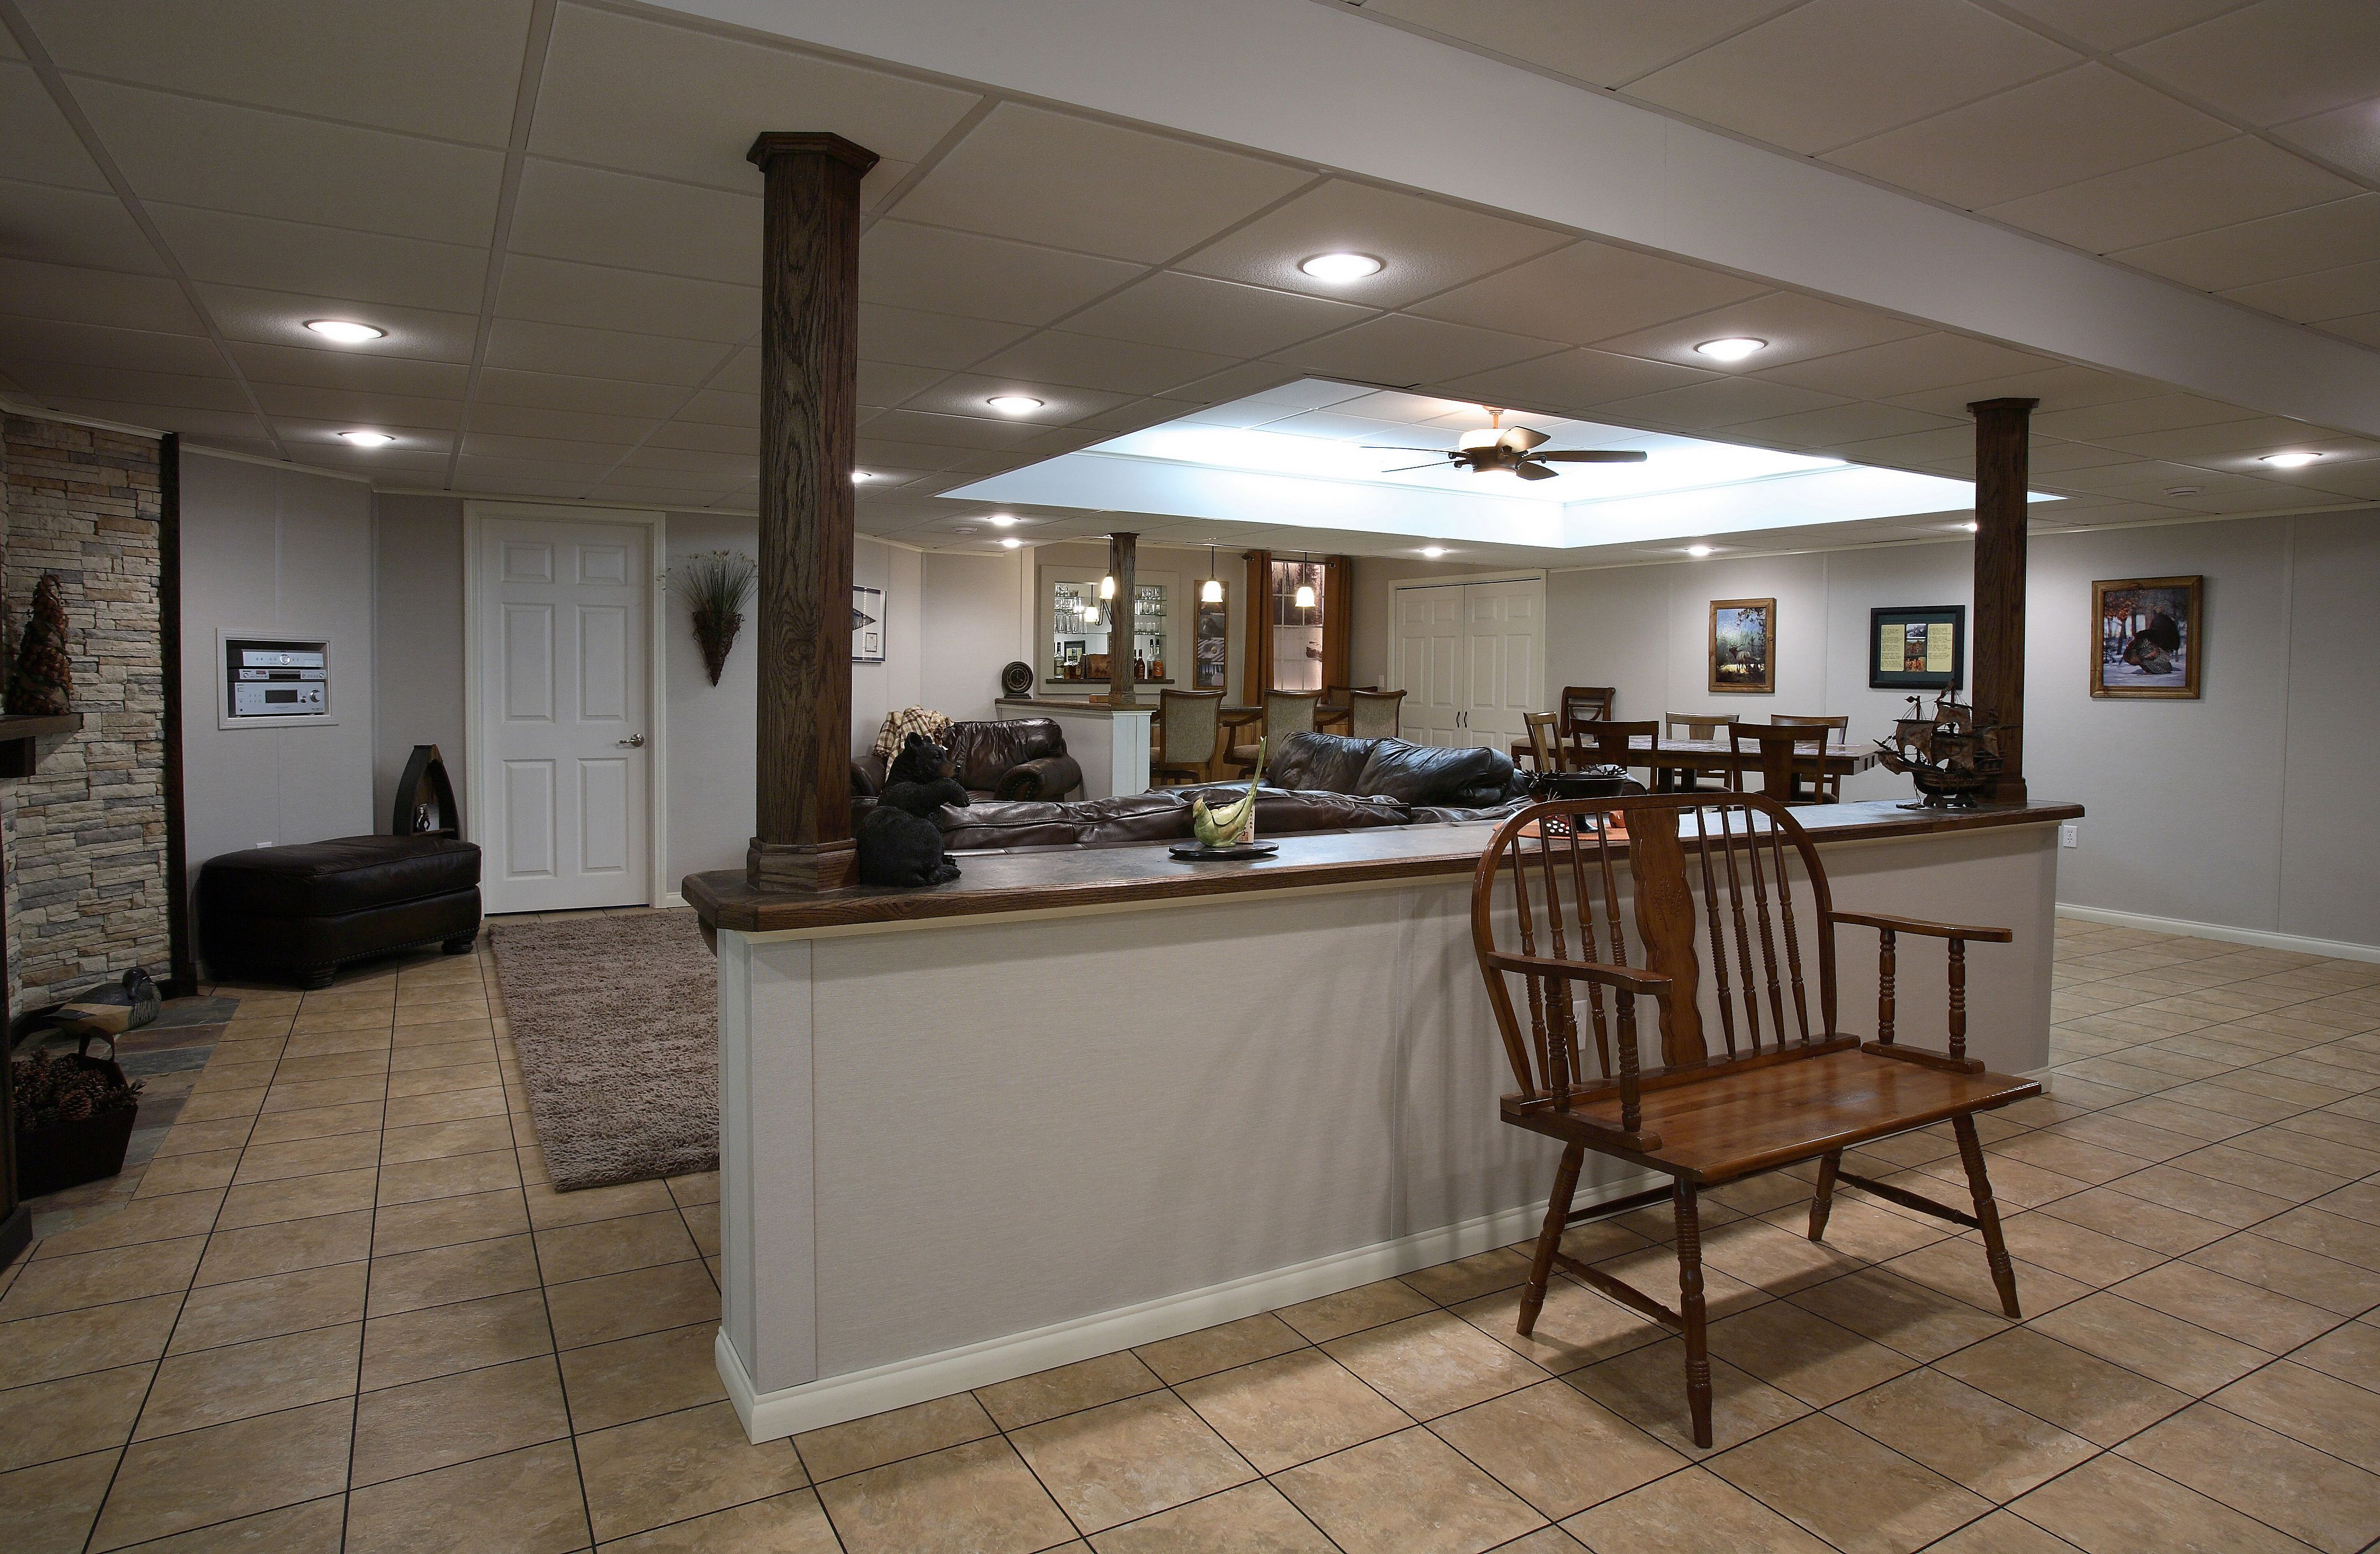 Basement Remodeling Basement Finishing Owens Corning Basement Living Rooms Basement Remodeling Basement Design